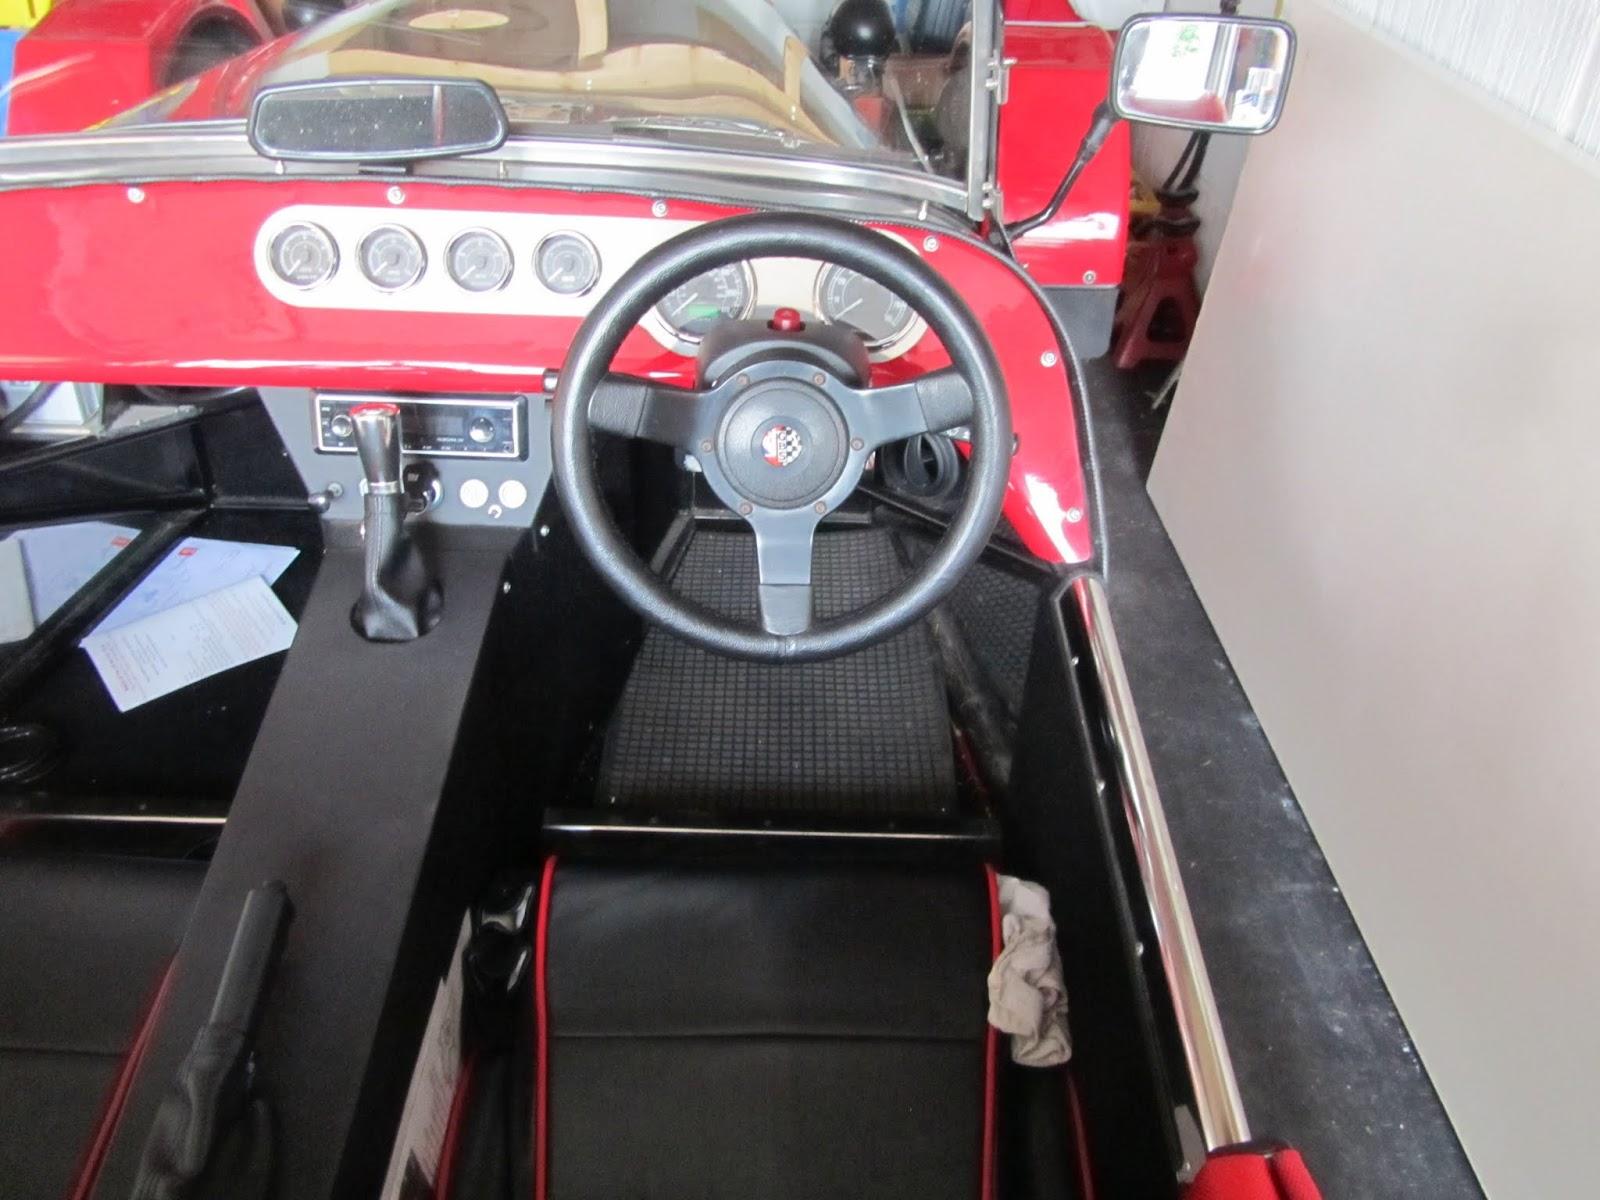 Road//Rally Kit Ford Escort MK1// Mk2 Steering Rack 2.9 Ratio ALL NEW